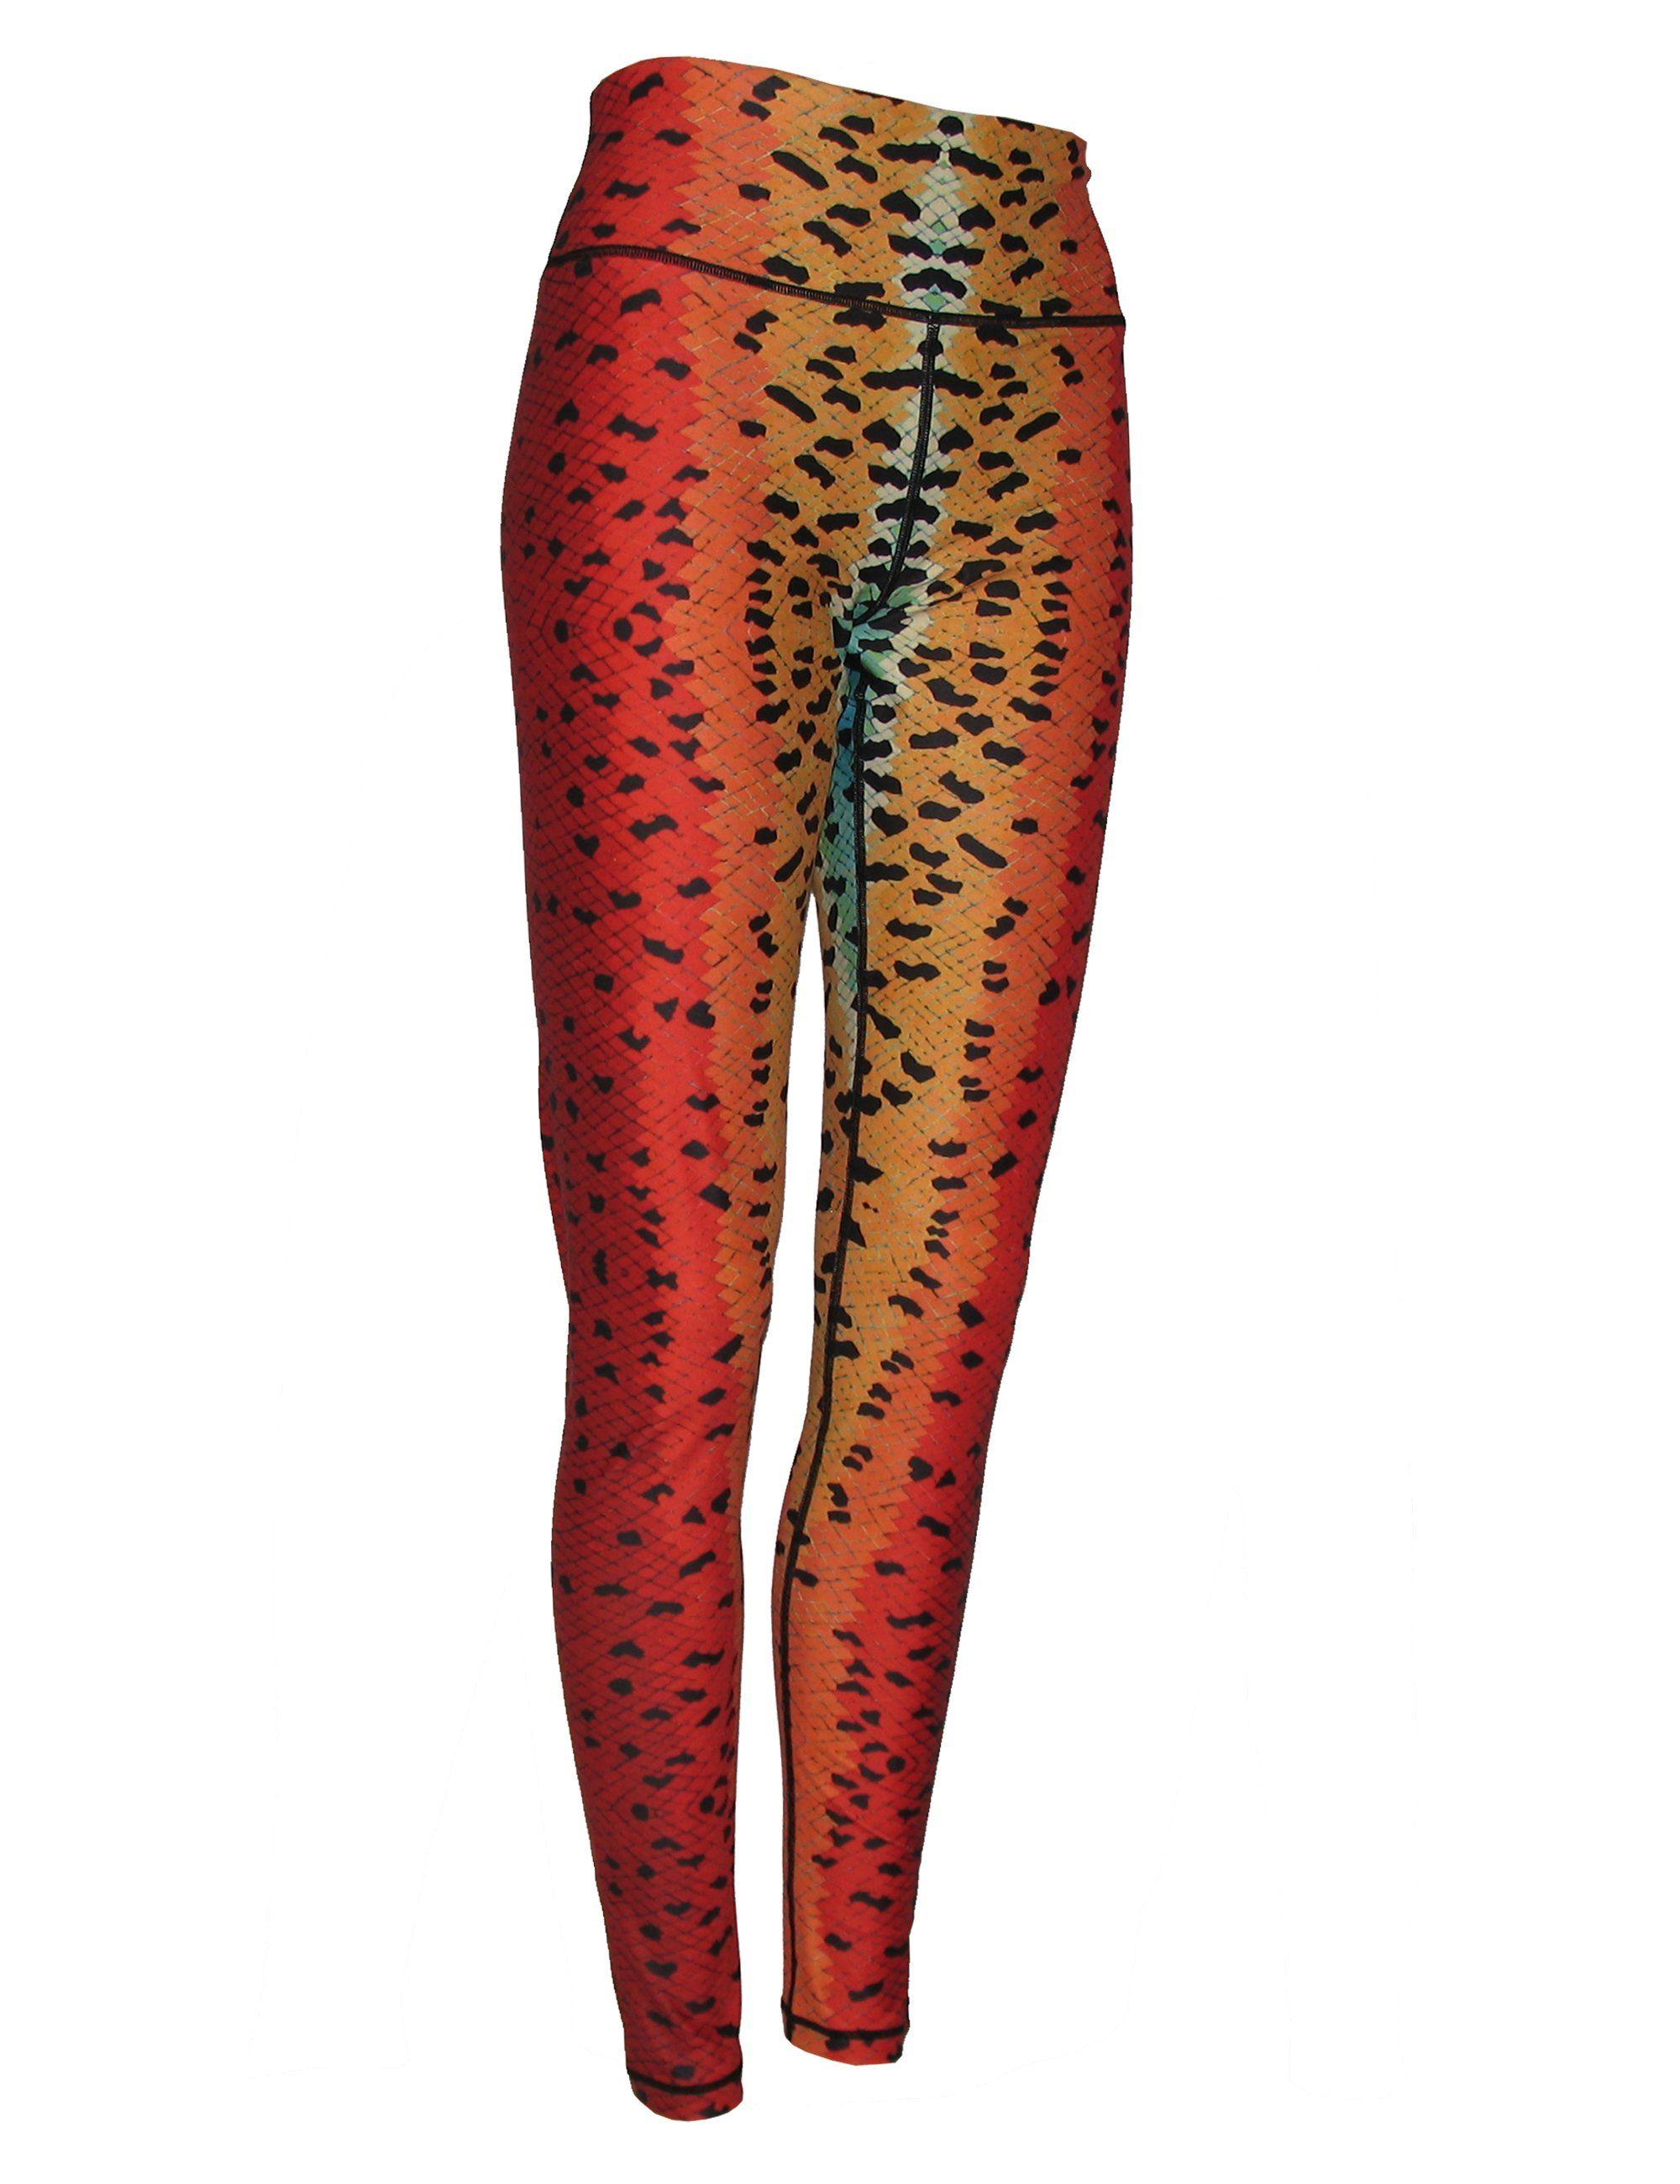 5cc5a40a5e632 Rainbow#2 Trout All Sport Leggings | Products | Sports leggings ...